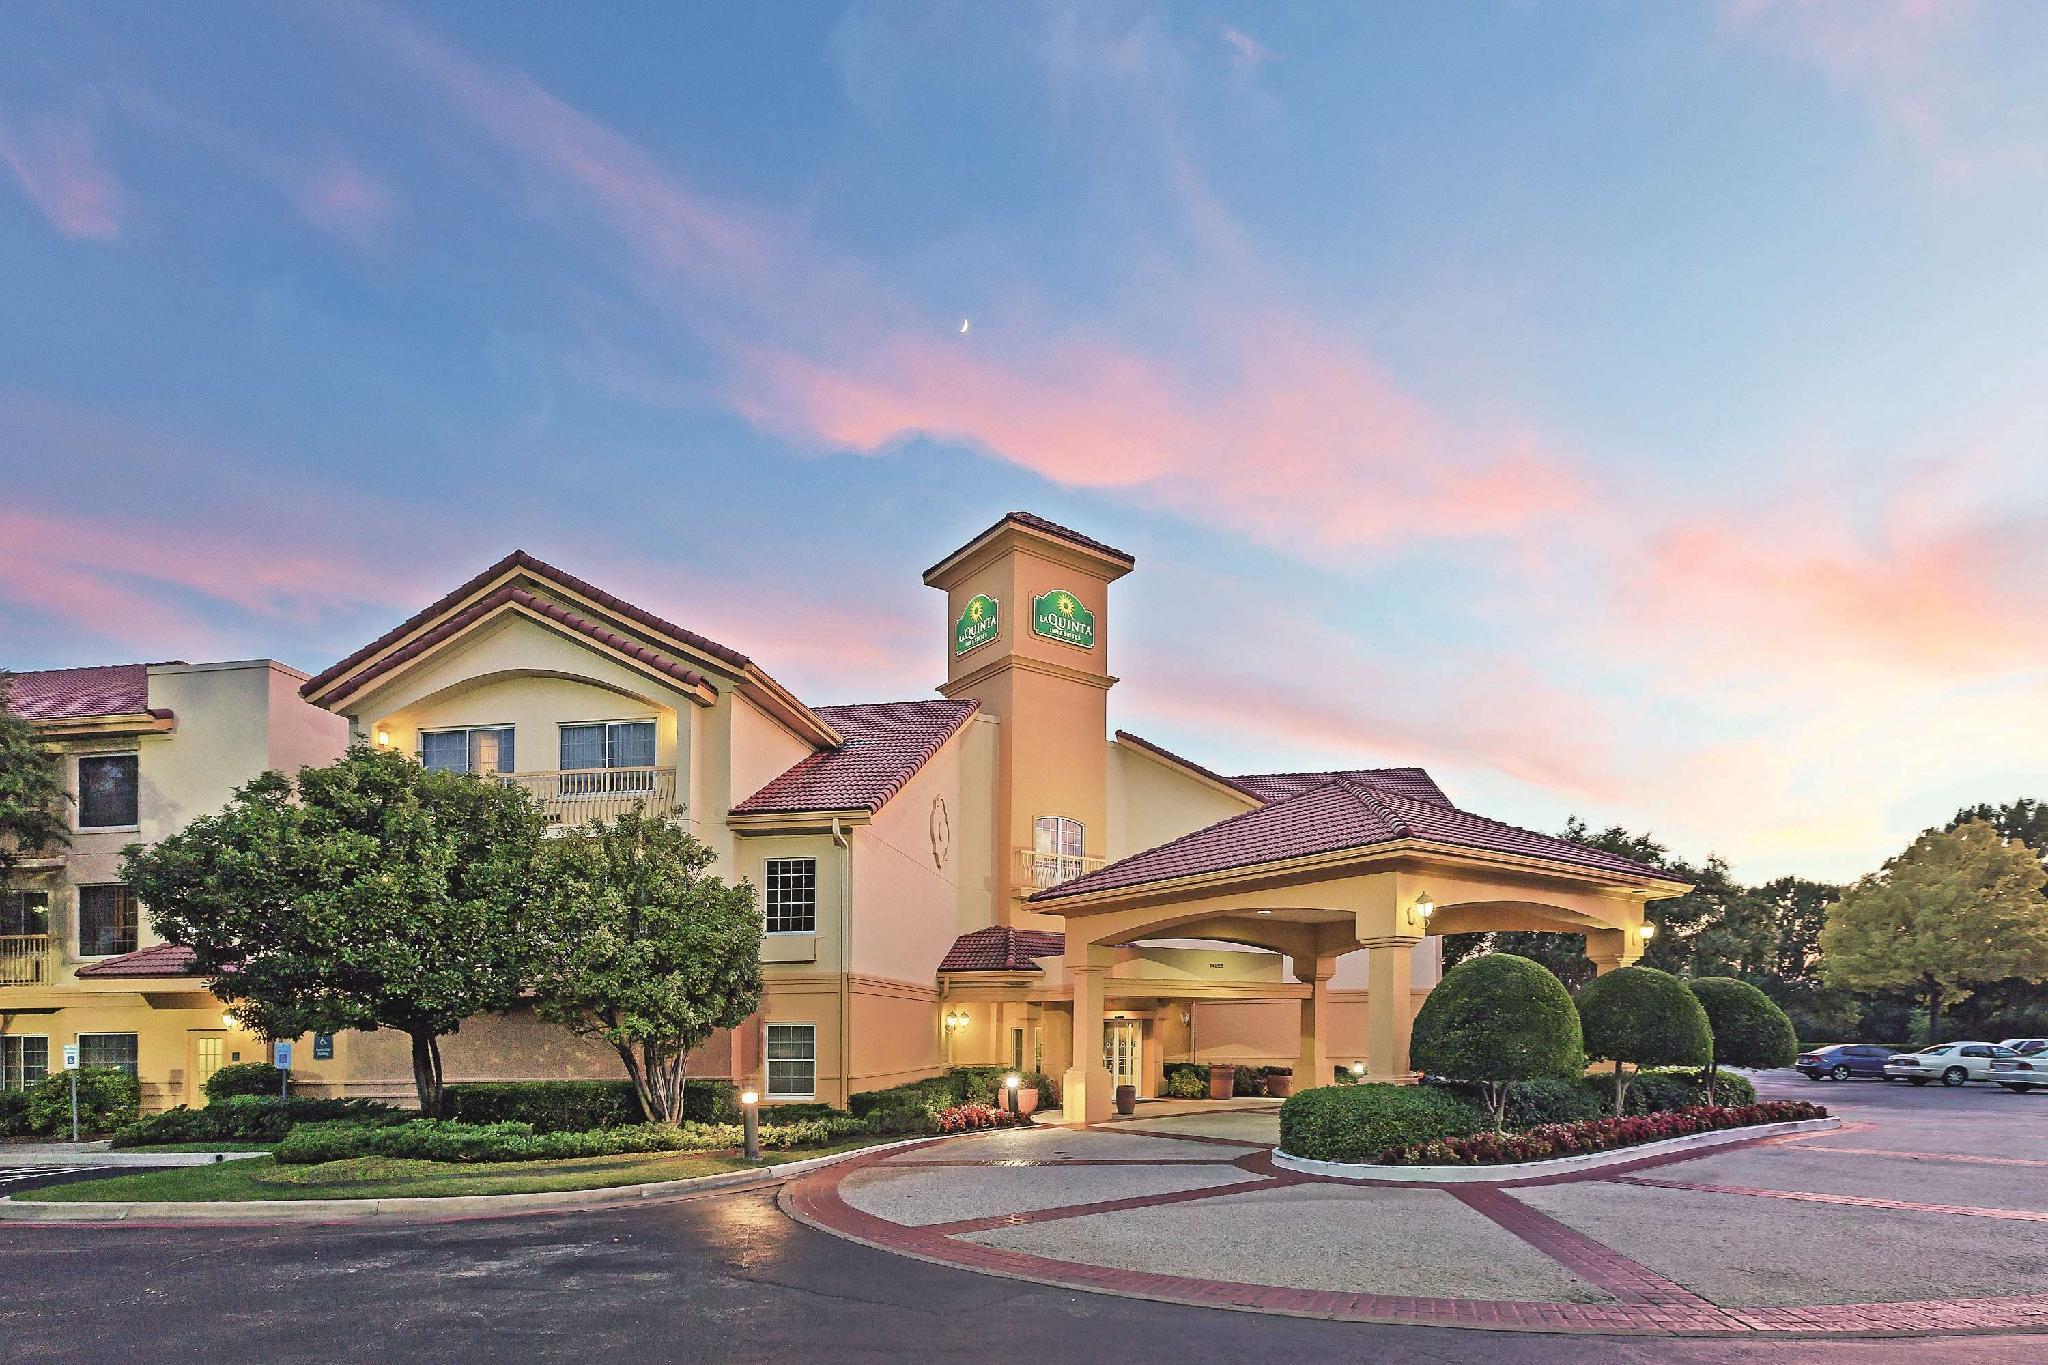 La Quinta Inn And Suites By Wyndham Dallas   Addison Galleria